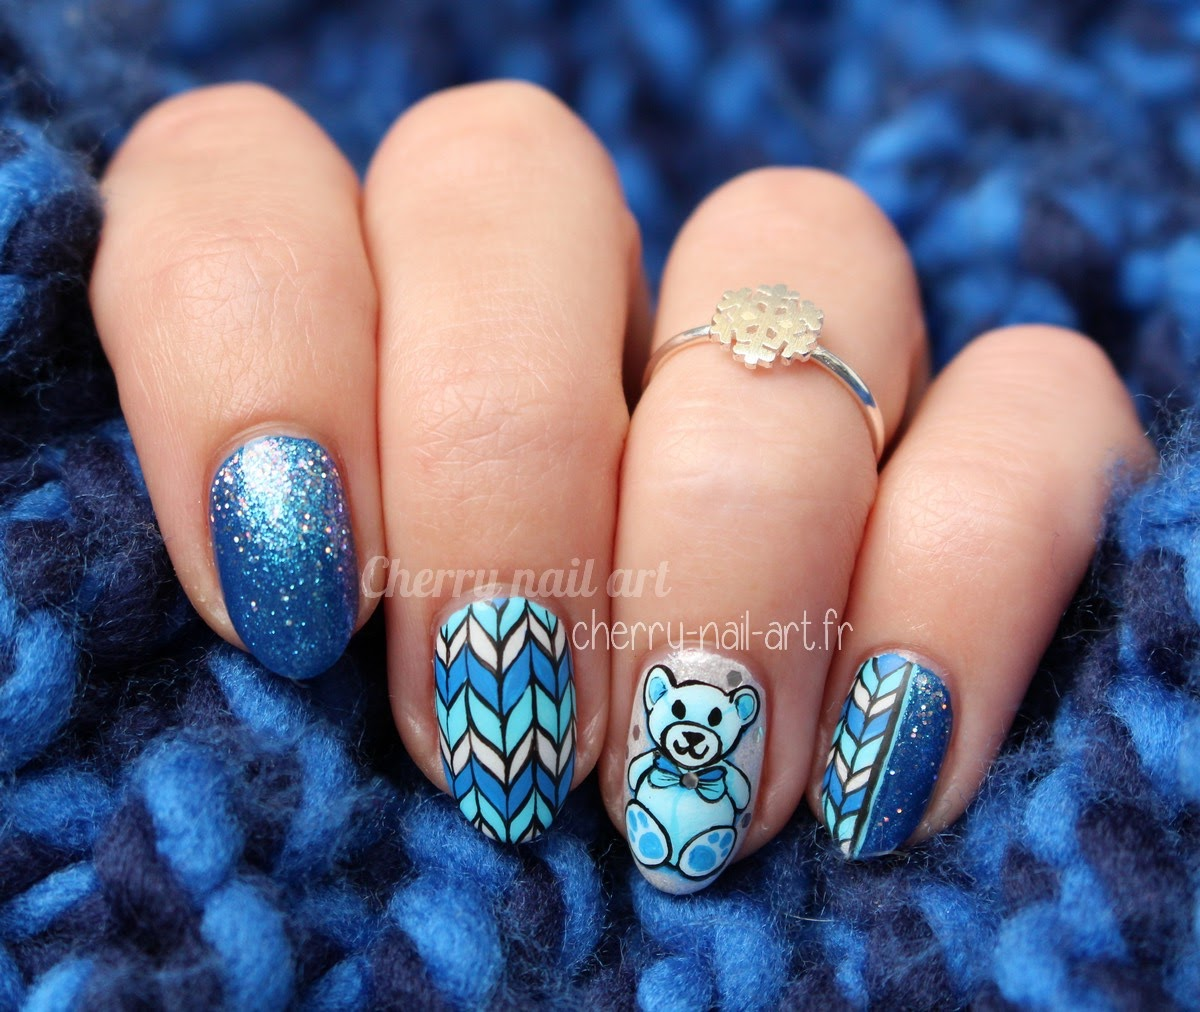 nail-art-noël-hiver-nounours-tricot-nouvel-an-fëtes-paillettes